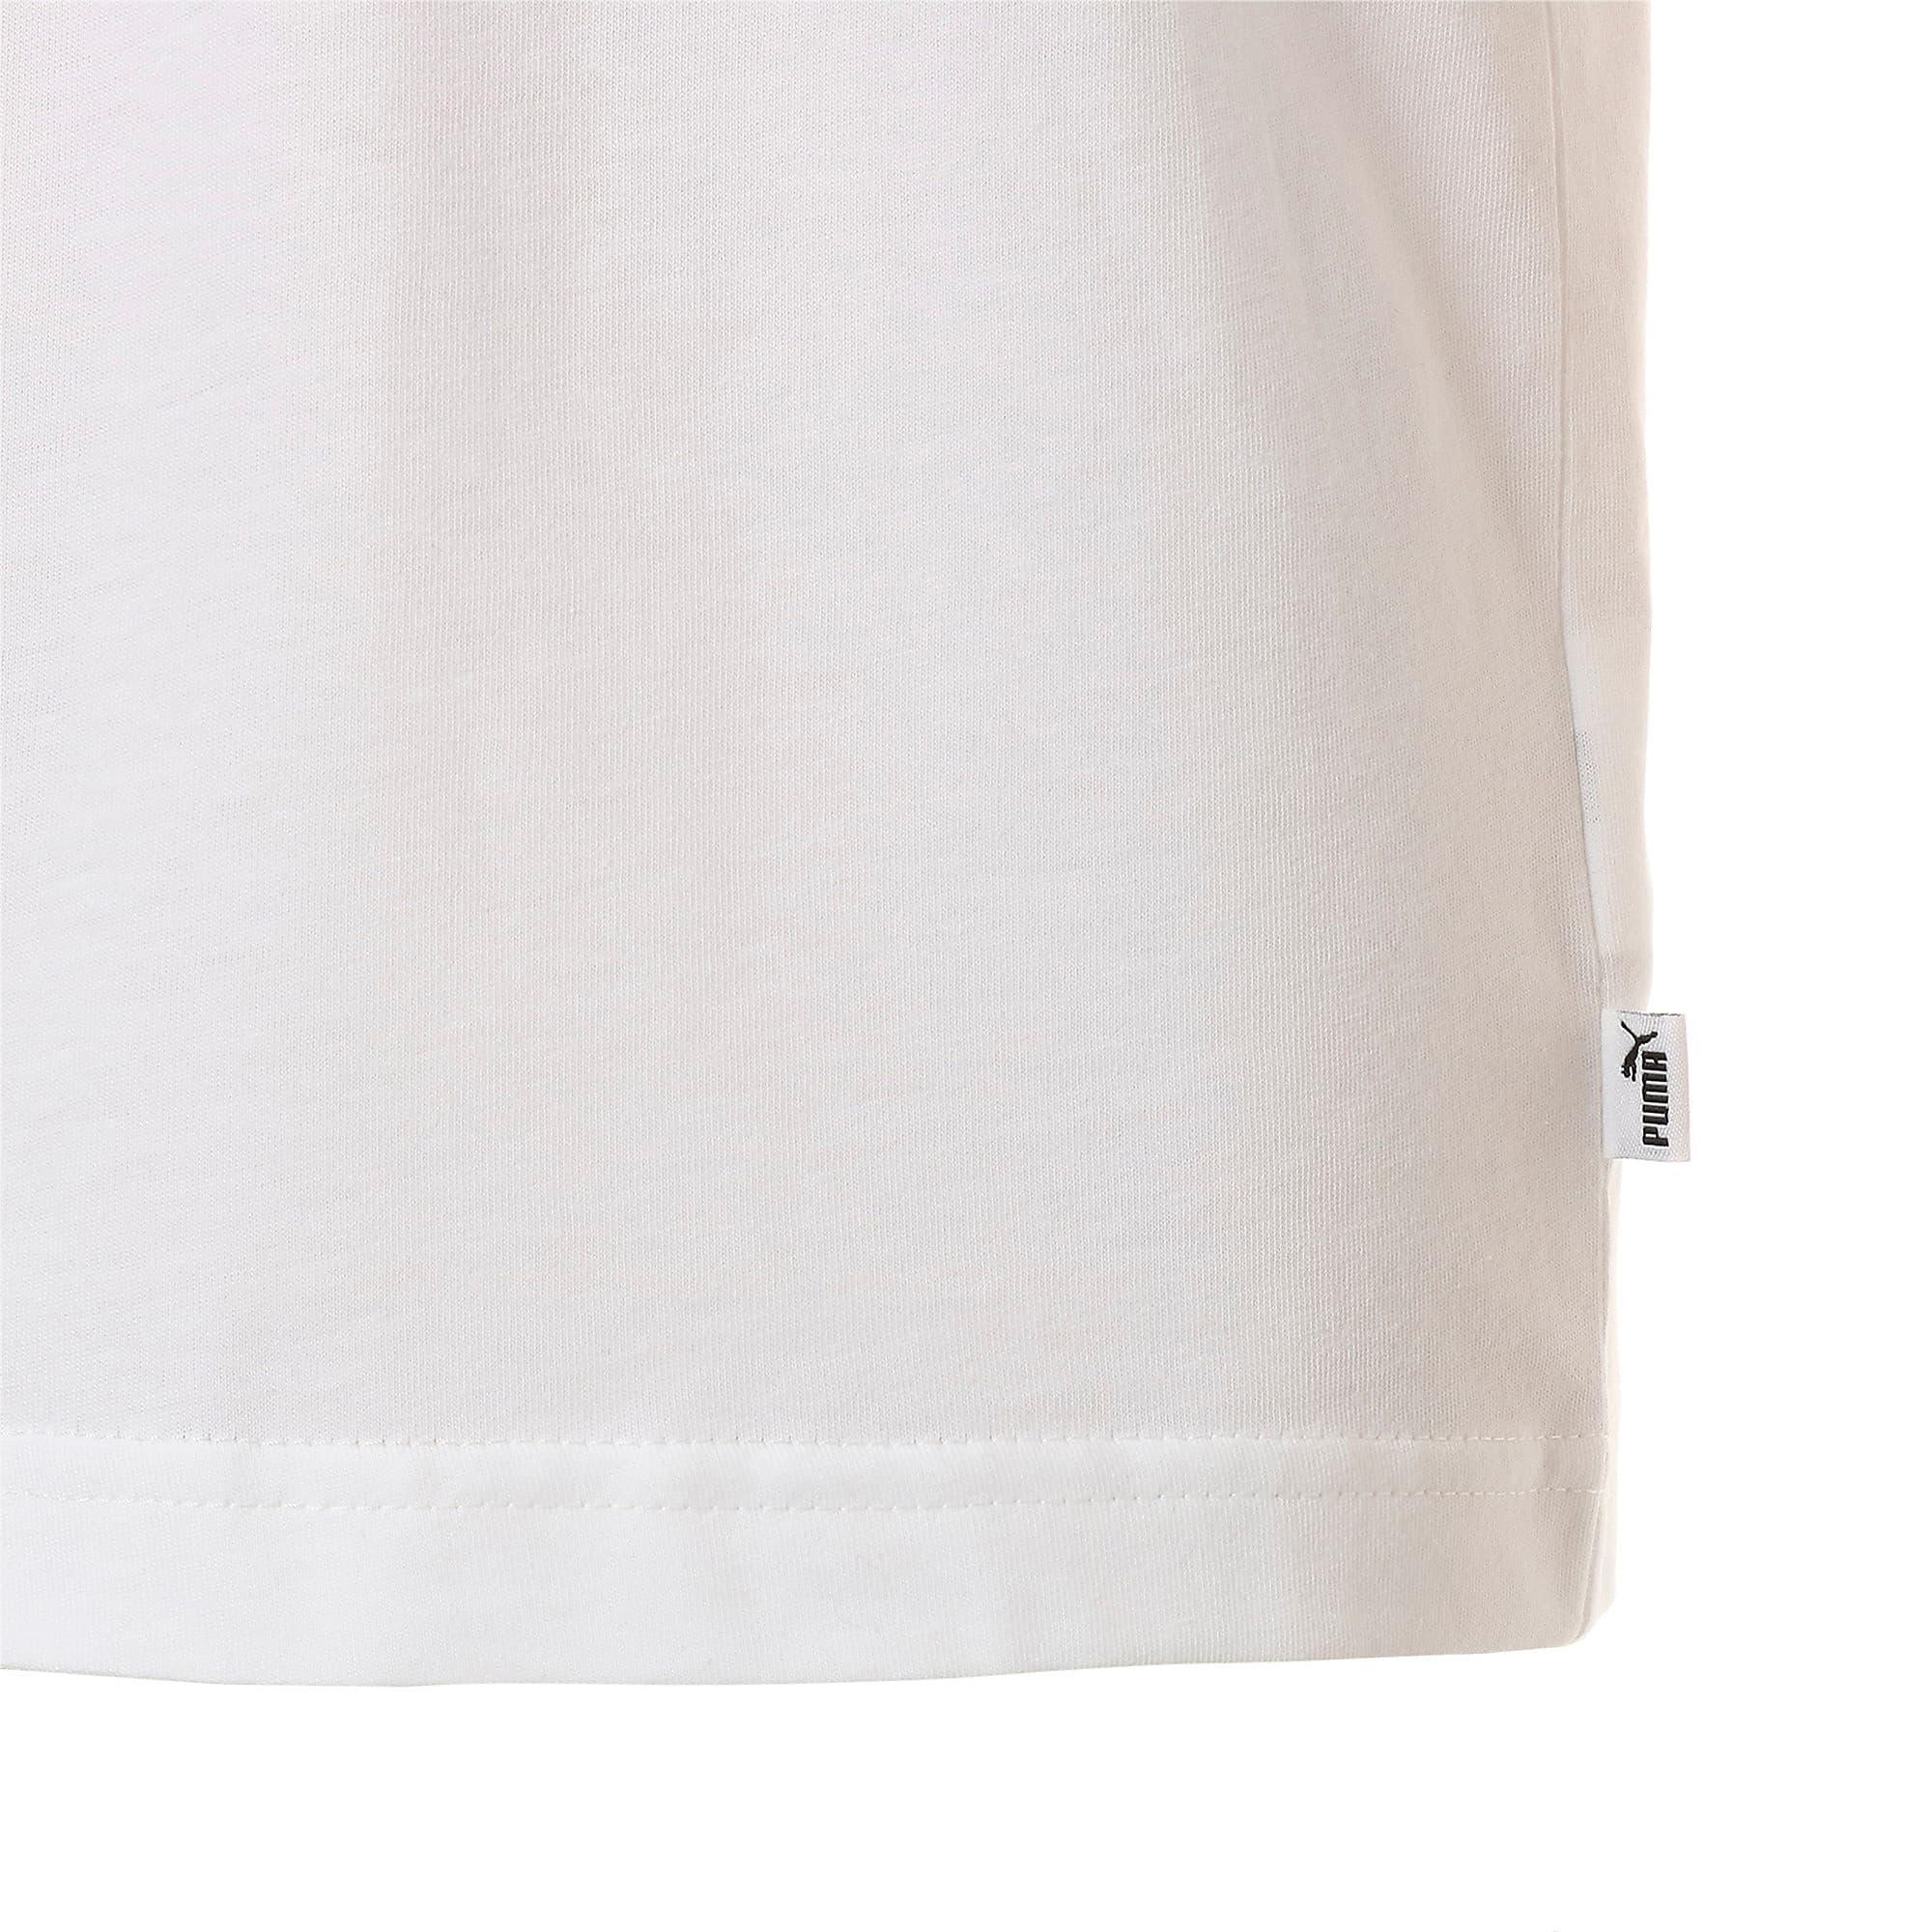 Thumbnail 6 of キッズ シティー 半袖 Tシャツ 2 OSAKA 大阪, Puma White, medium-JPN